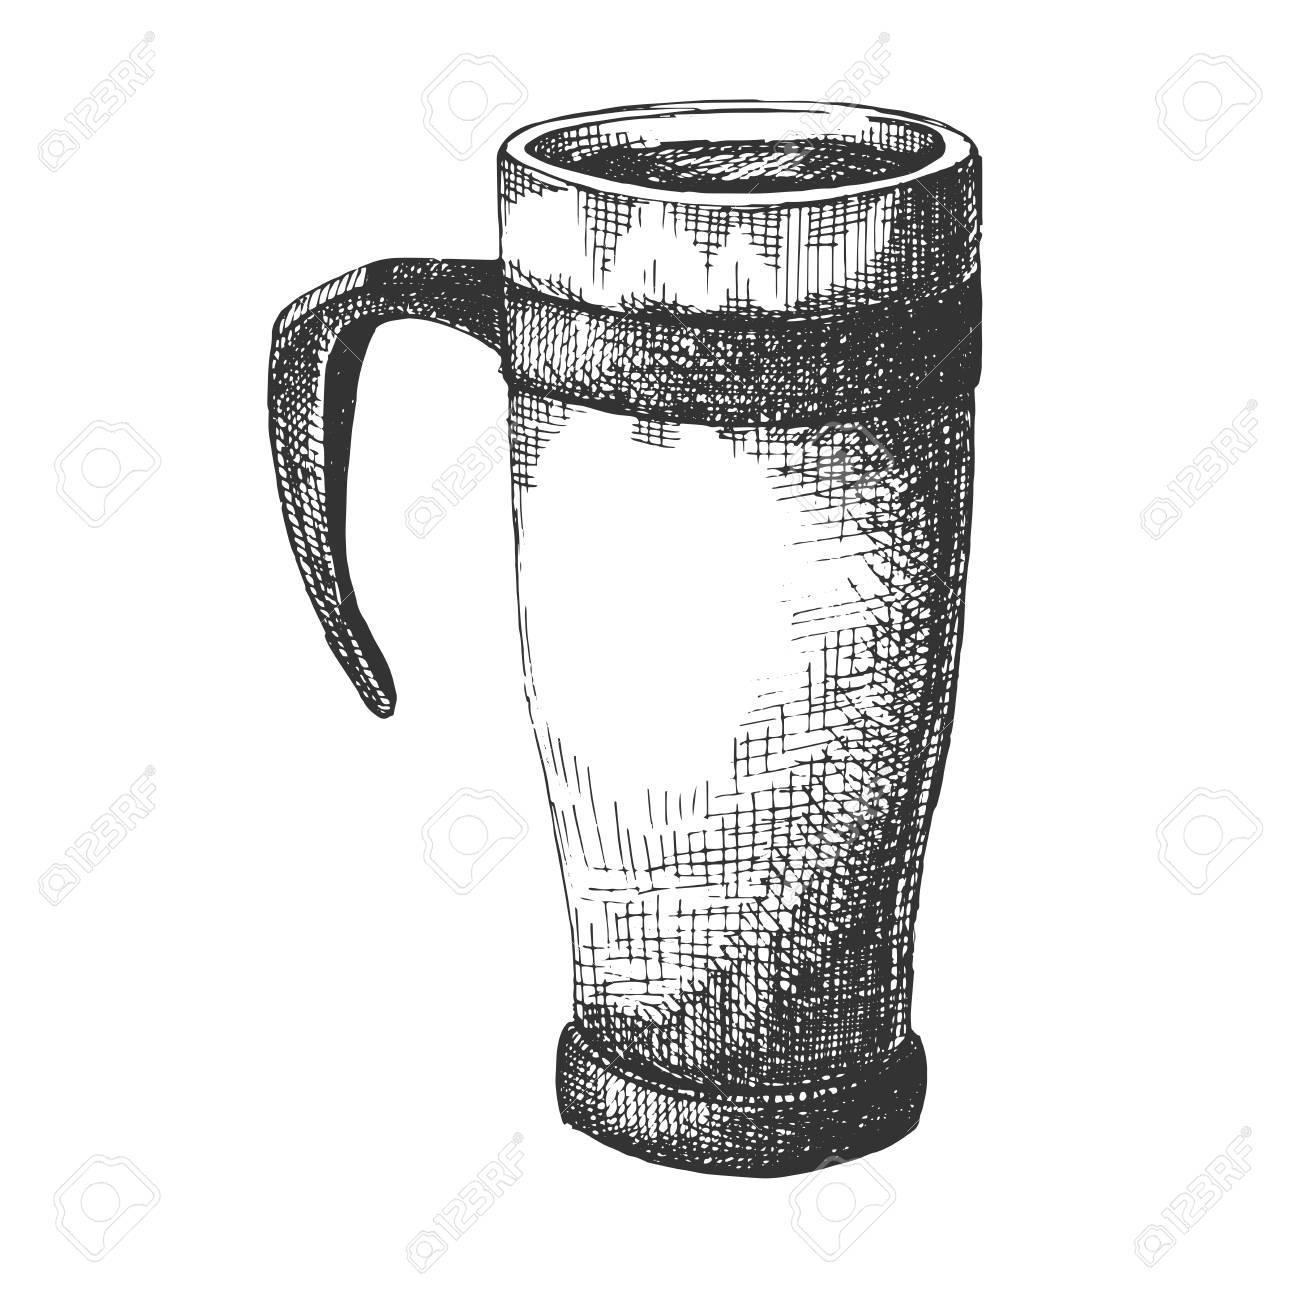 Sketch Travel Mug Travel Mug Isolated On White Background Royalty Free Cliparts Vectors And Stock Illustration Image 111452762